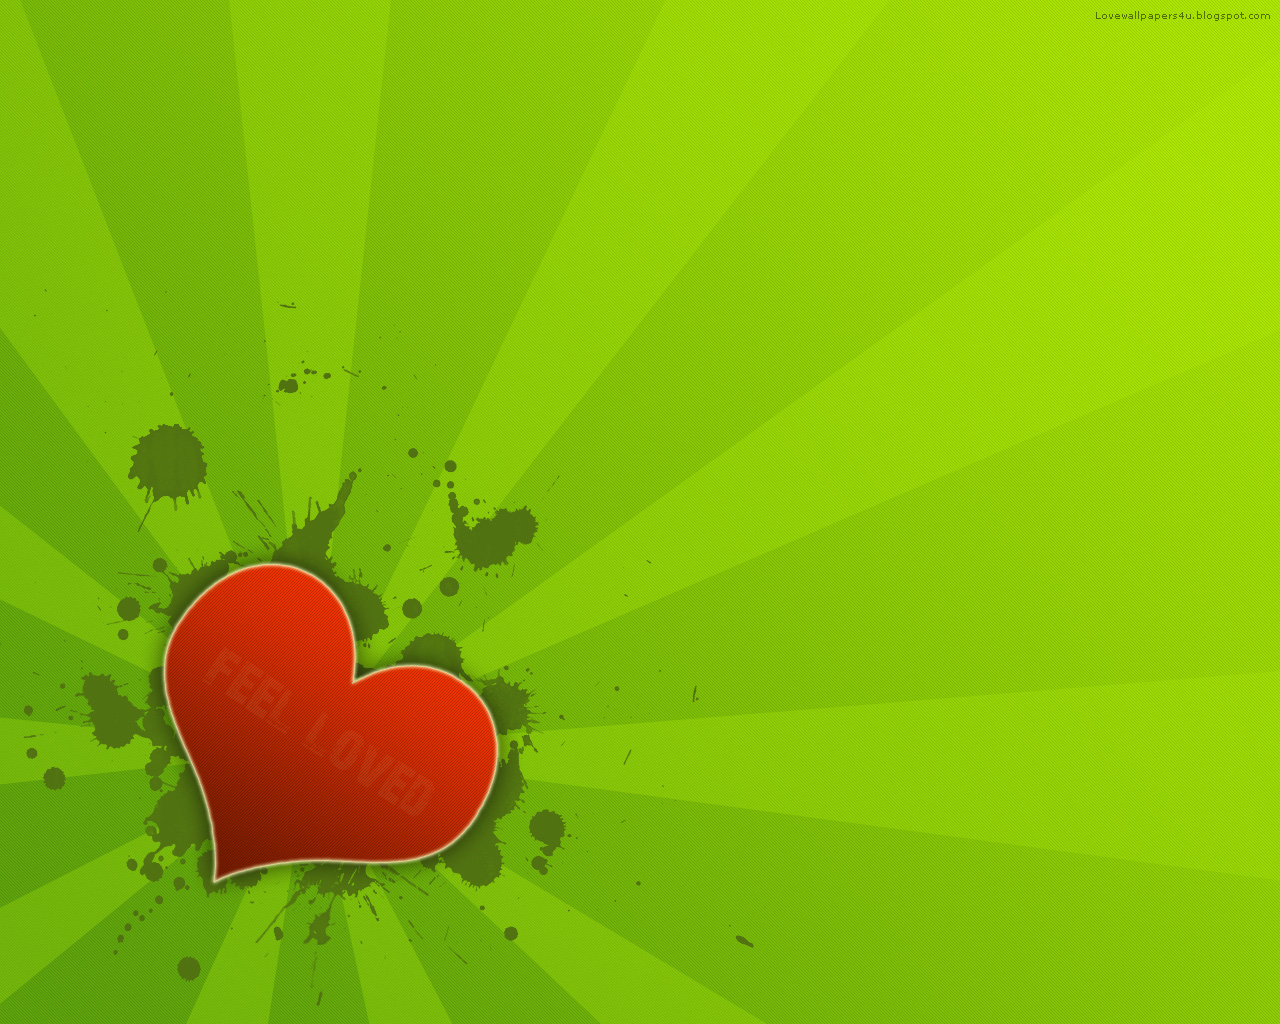 http://4.bp.blogspot.com/_mMuJXuUEoQk/SiUzgxL58kI/AAAAAAAAAP4/i3OUkg0yc-8/s1600/Feel-Loved.jpg